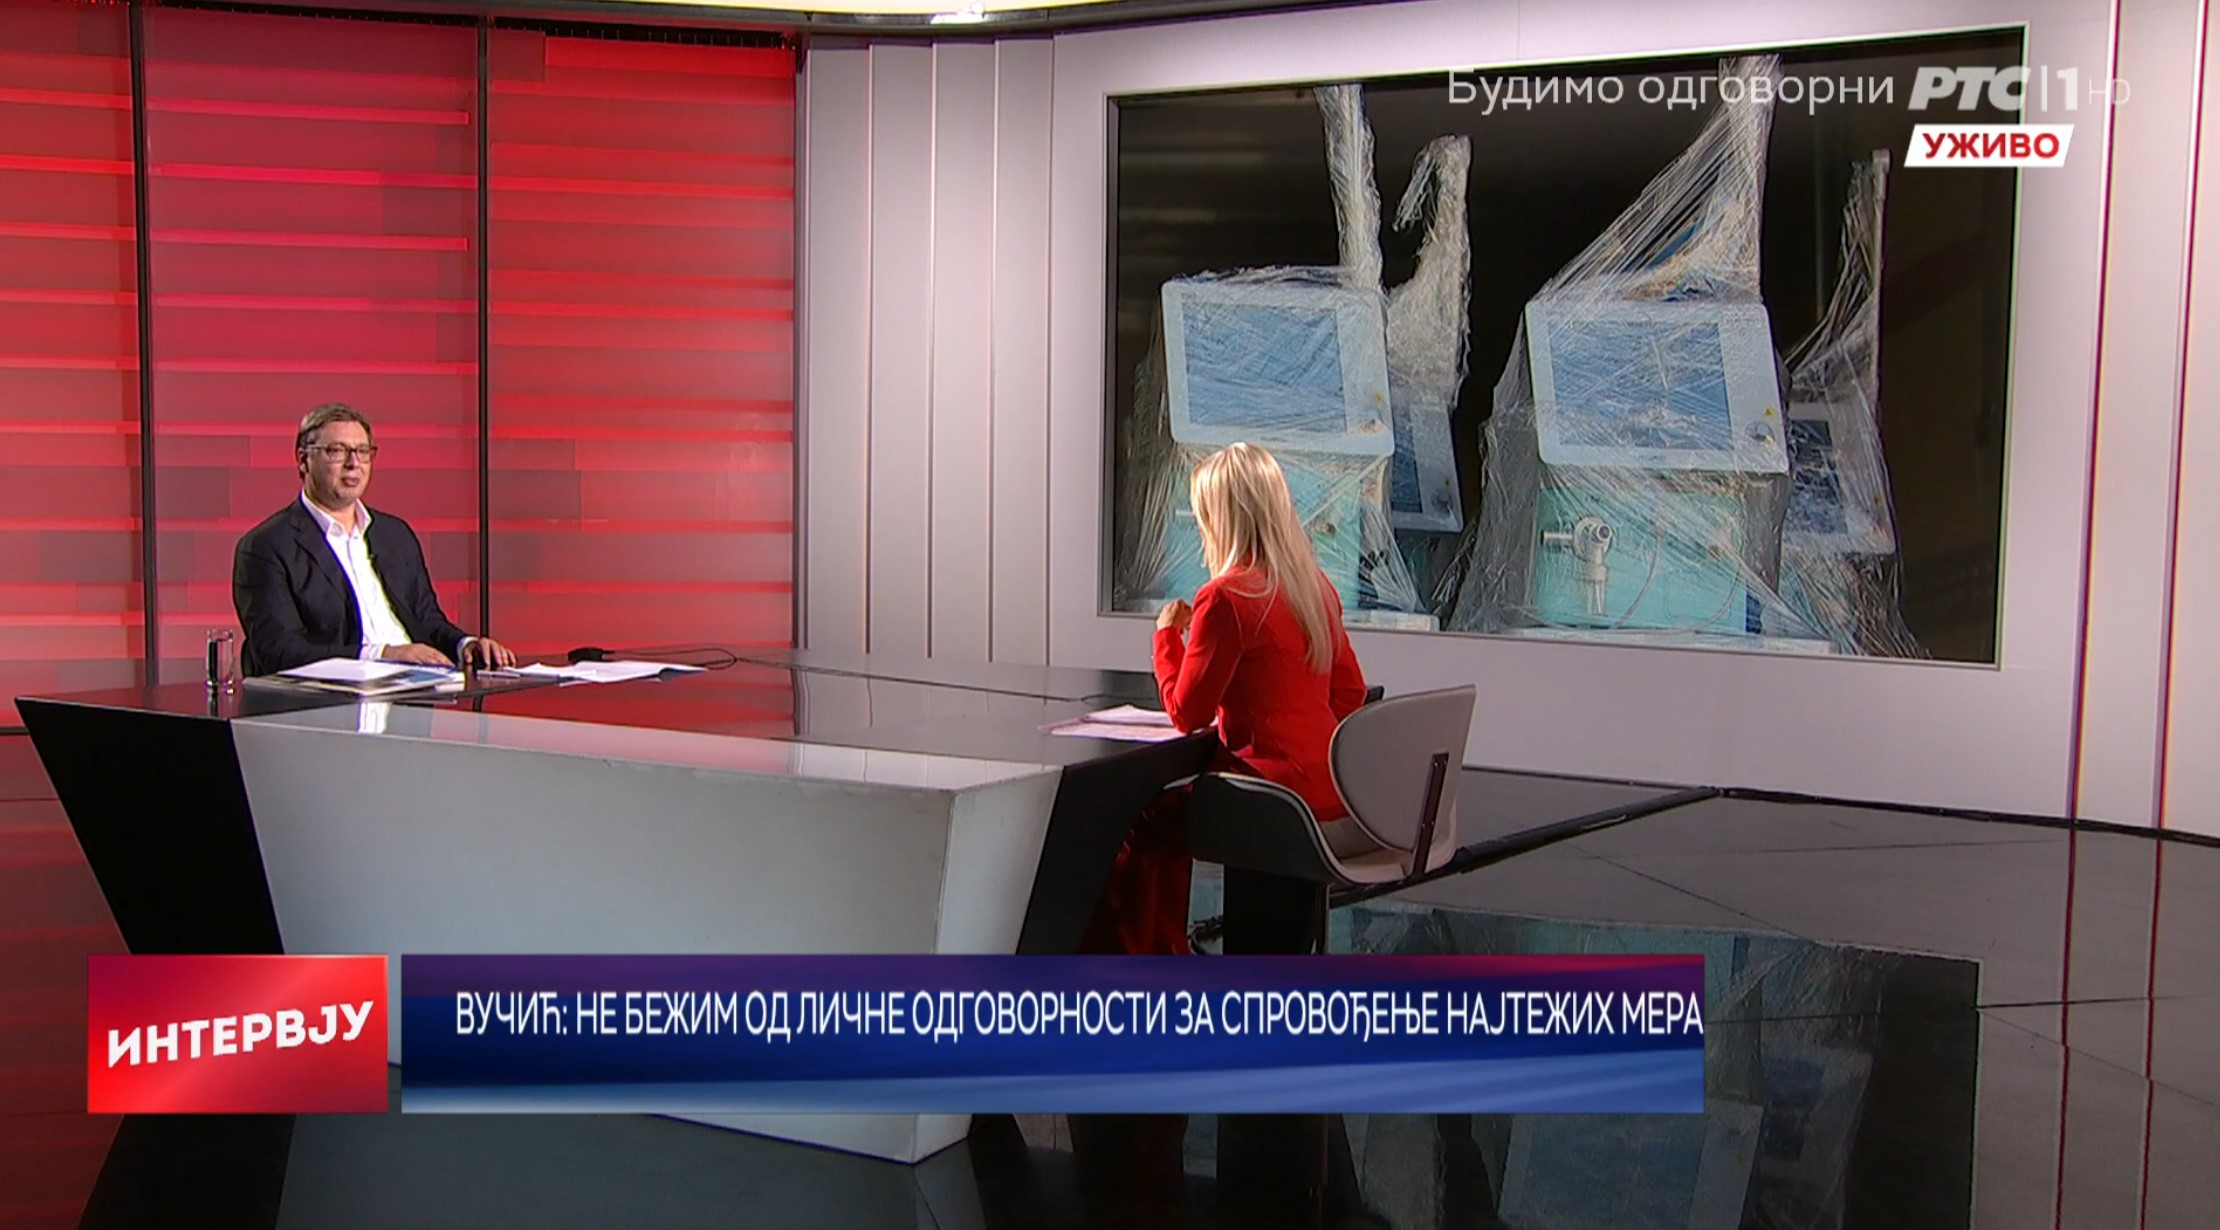 HIT: Vučića kandidovali za direktora RTS! 1